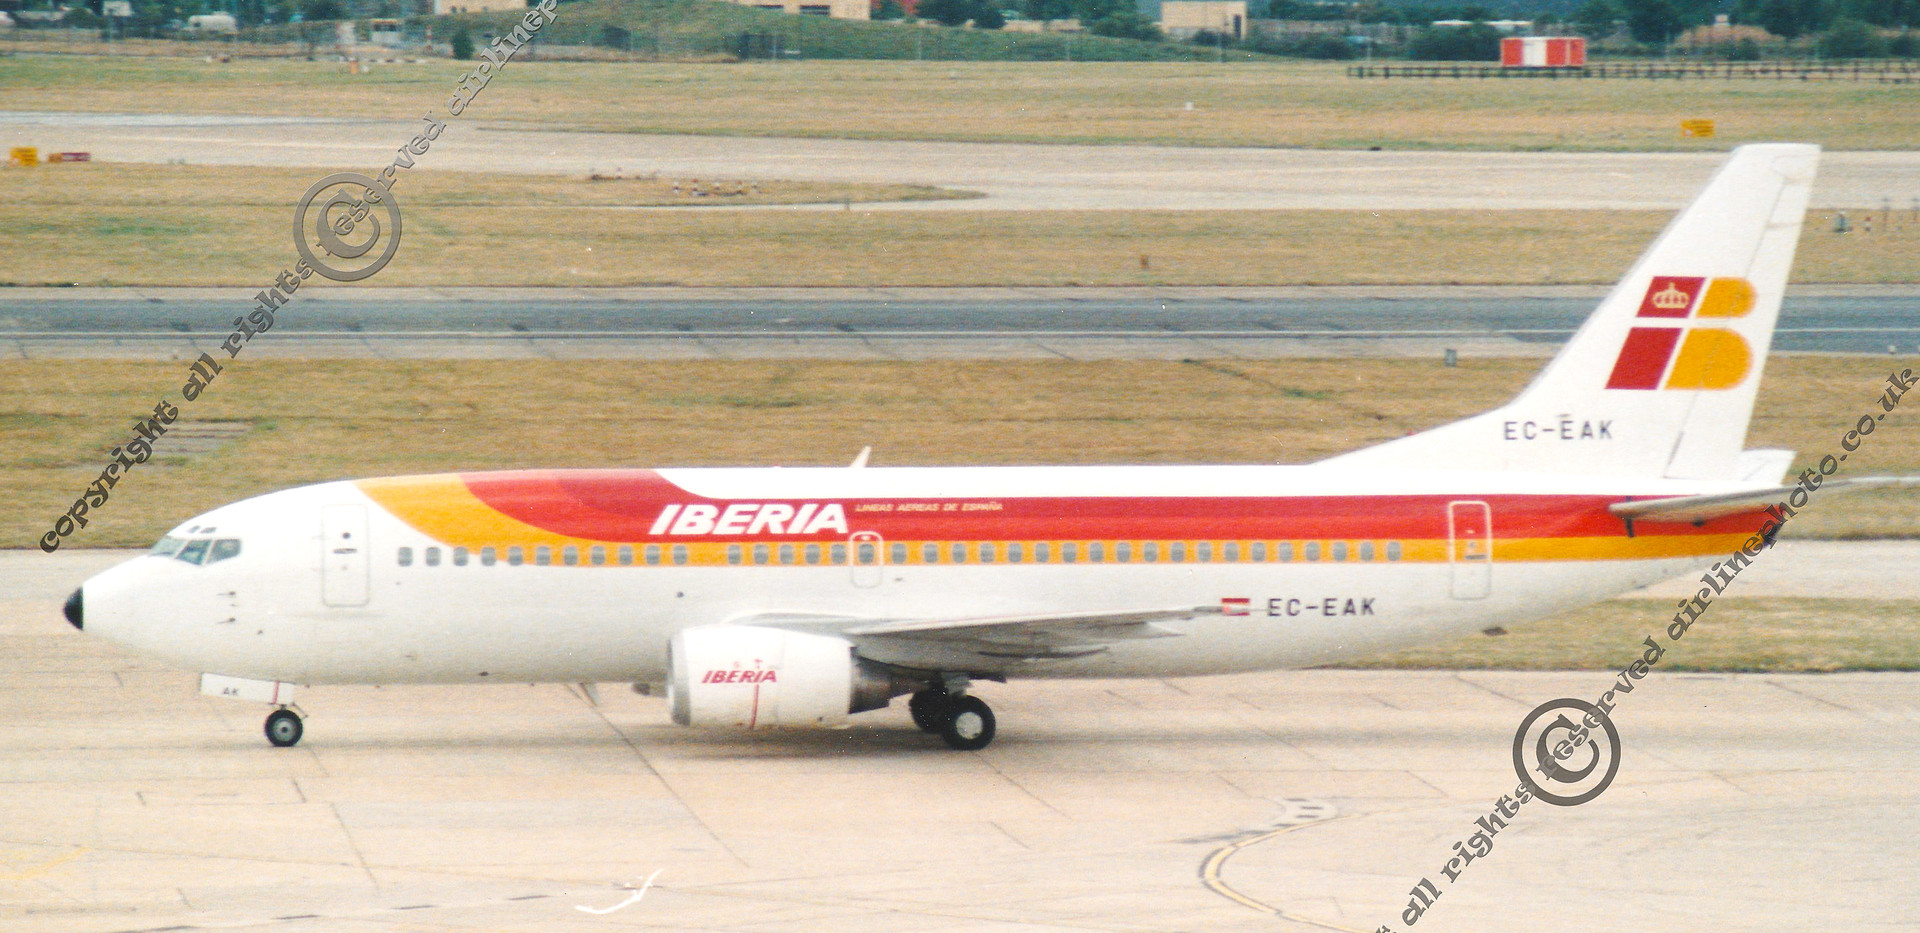 EC-EAK-Iberia-737-LHR-1989.jpg